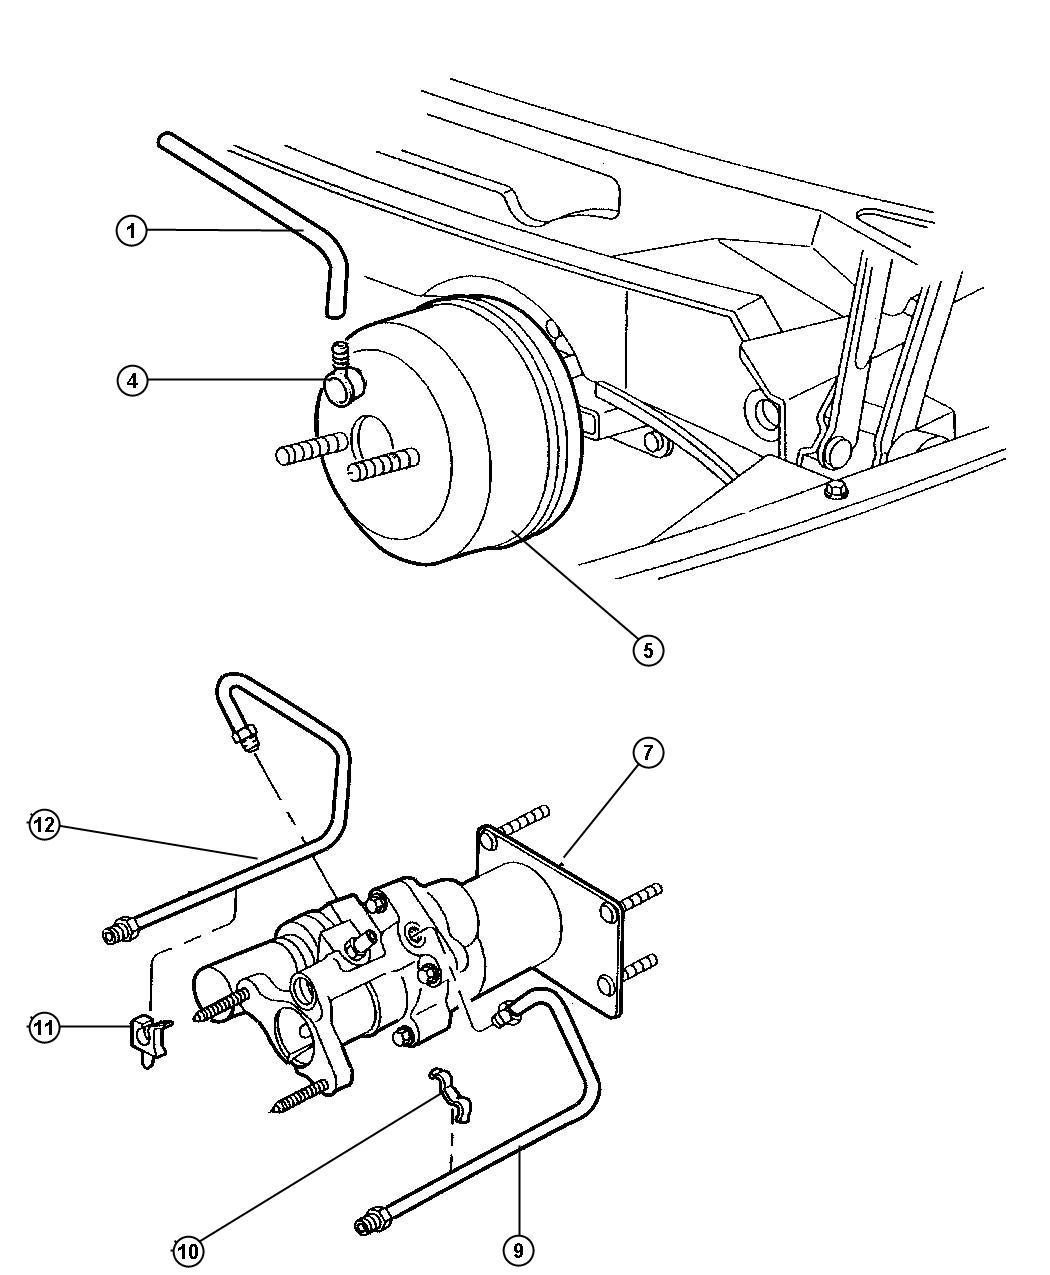 1997 Dodge Ram 3500 Booster. Power brake. Mopar, hydro